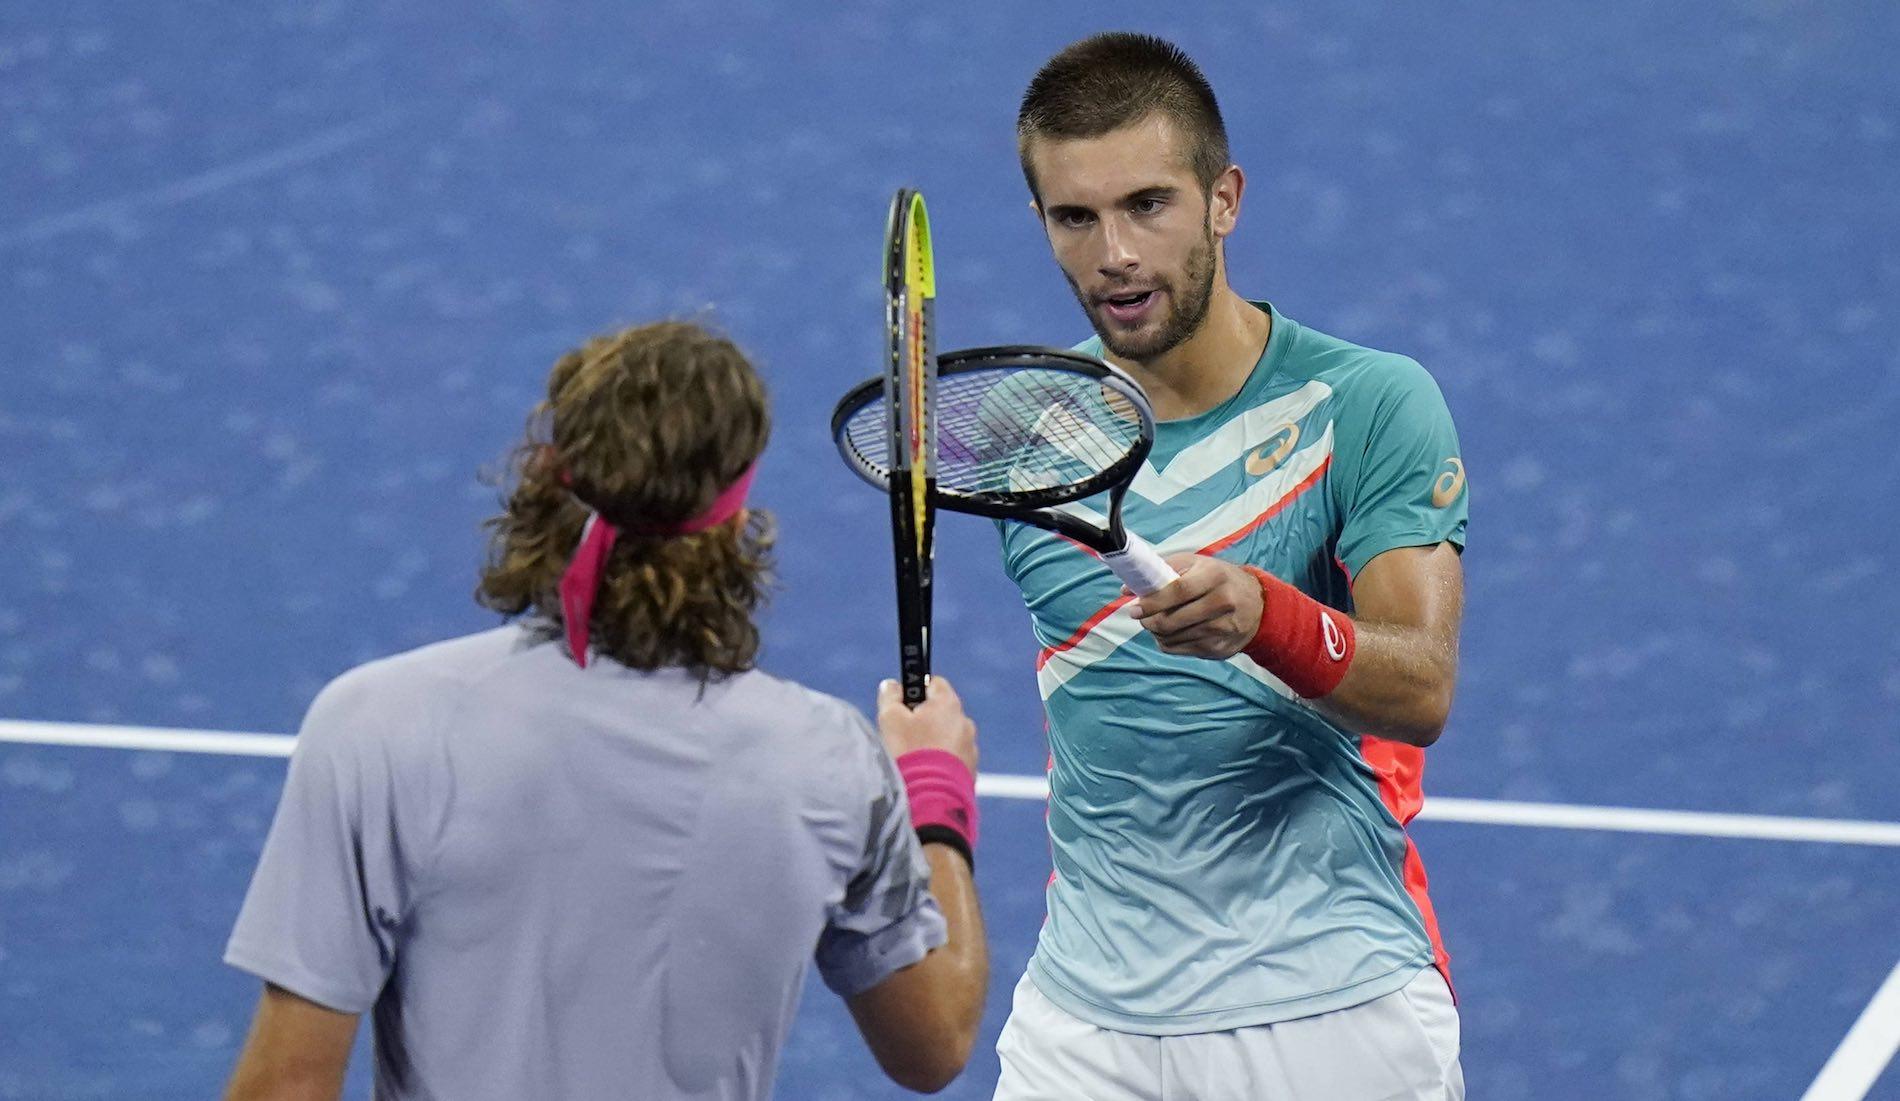 Borna Coric and Stefanos Tsitsipas, US Open 2020